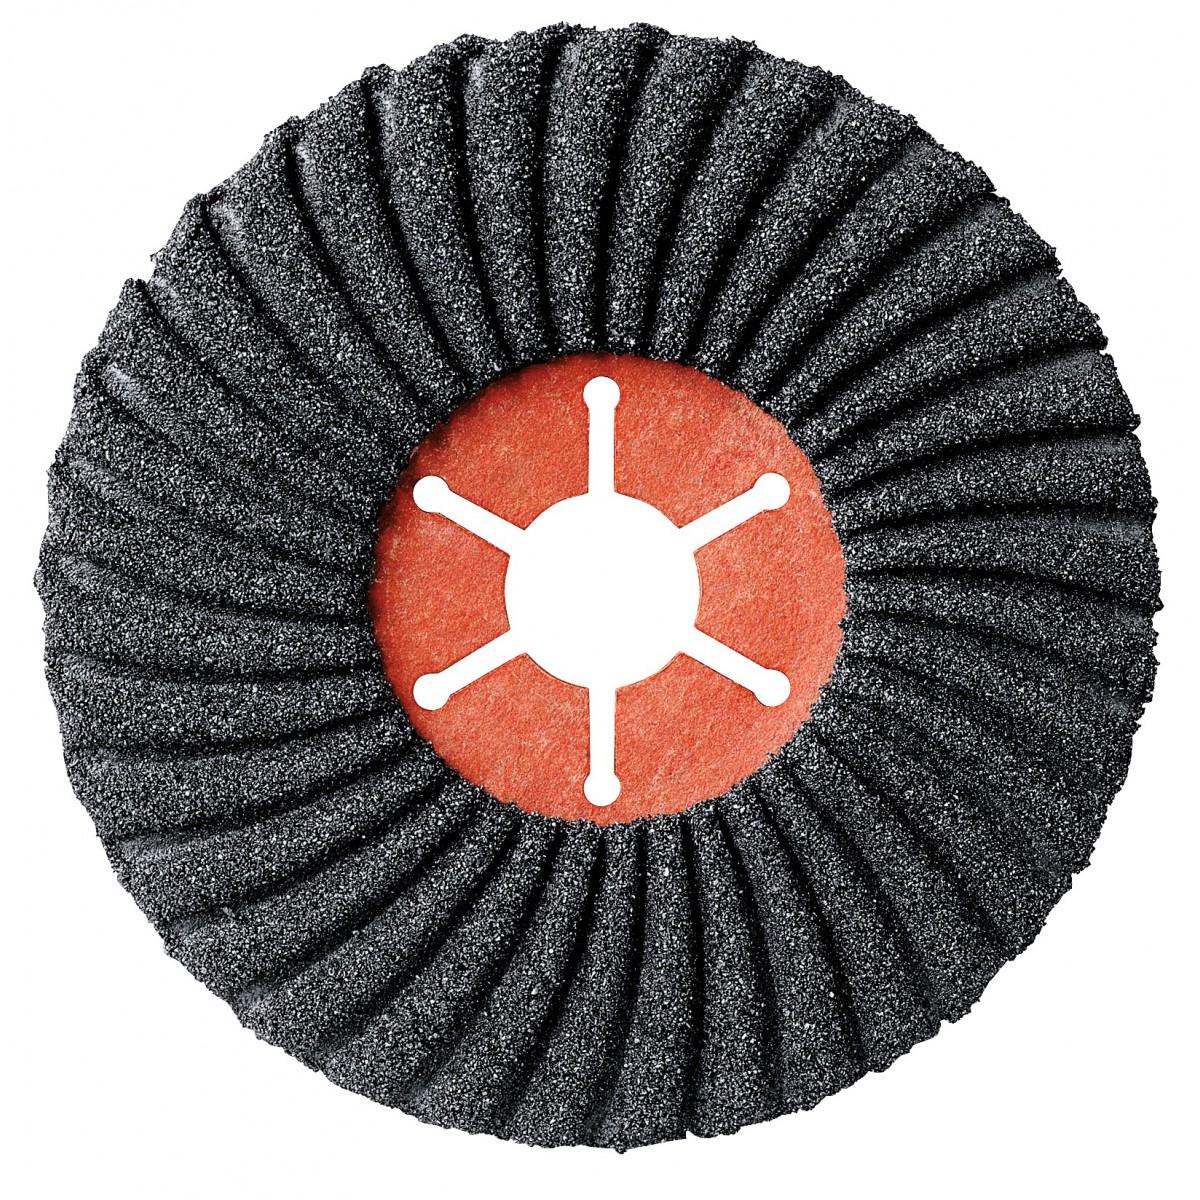 Disque semiflexible carbure de silicium diamètre 125 x 22 mm SCID - Grain 60